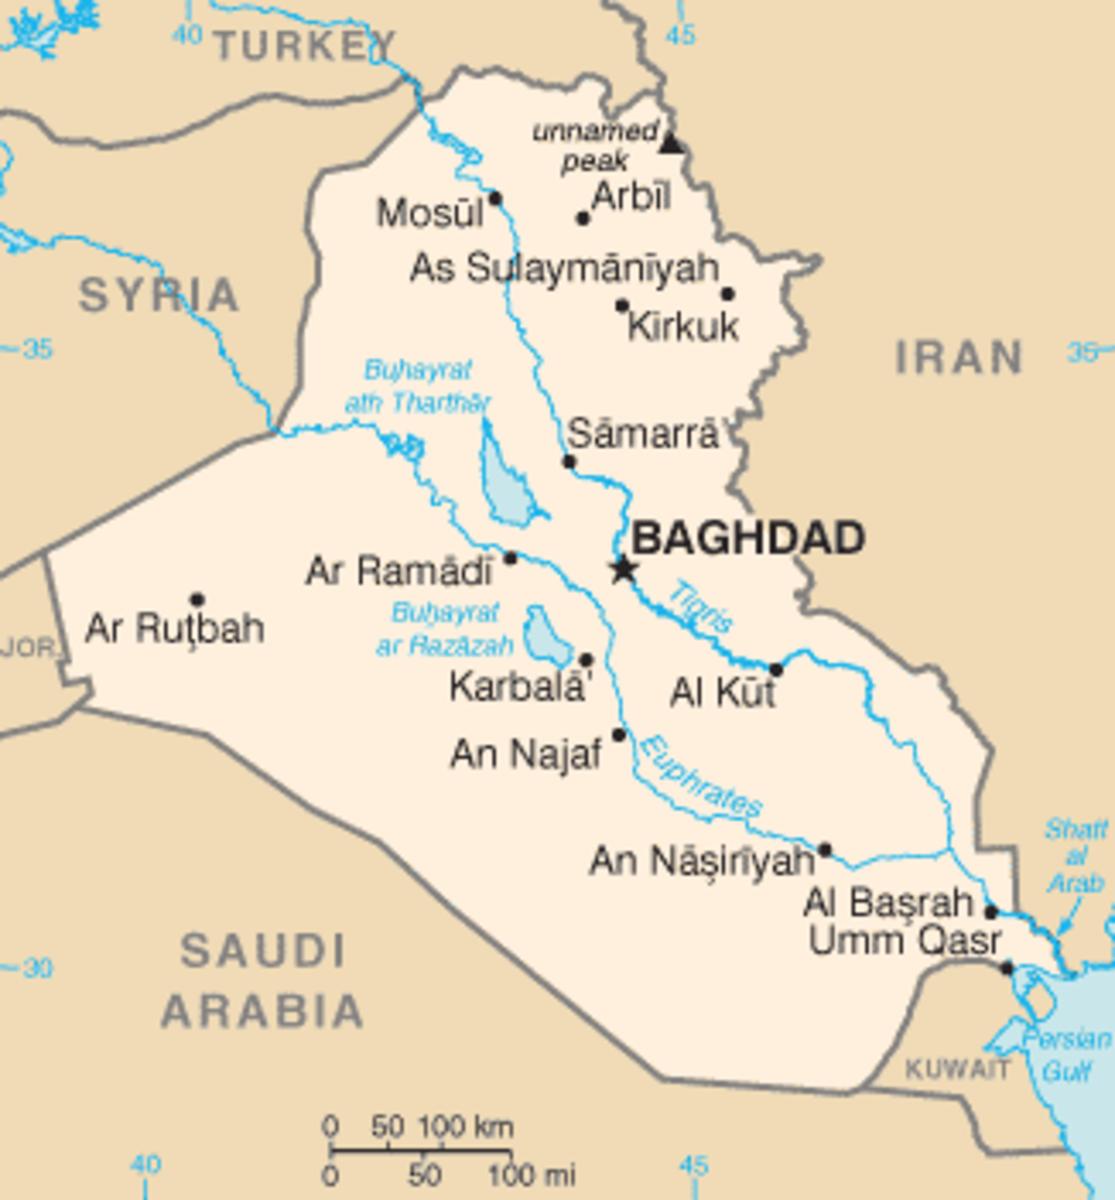 Iraq before ISIS invasion